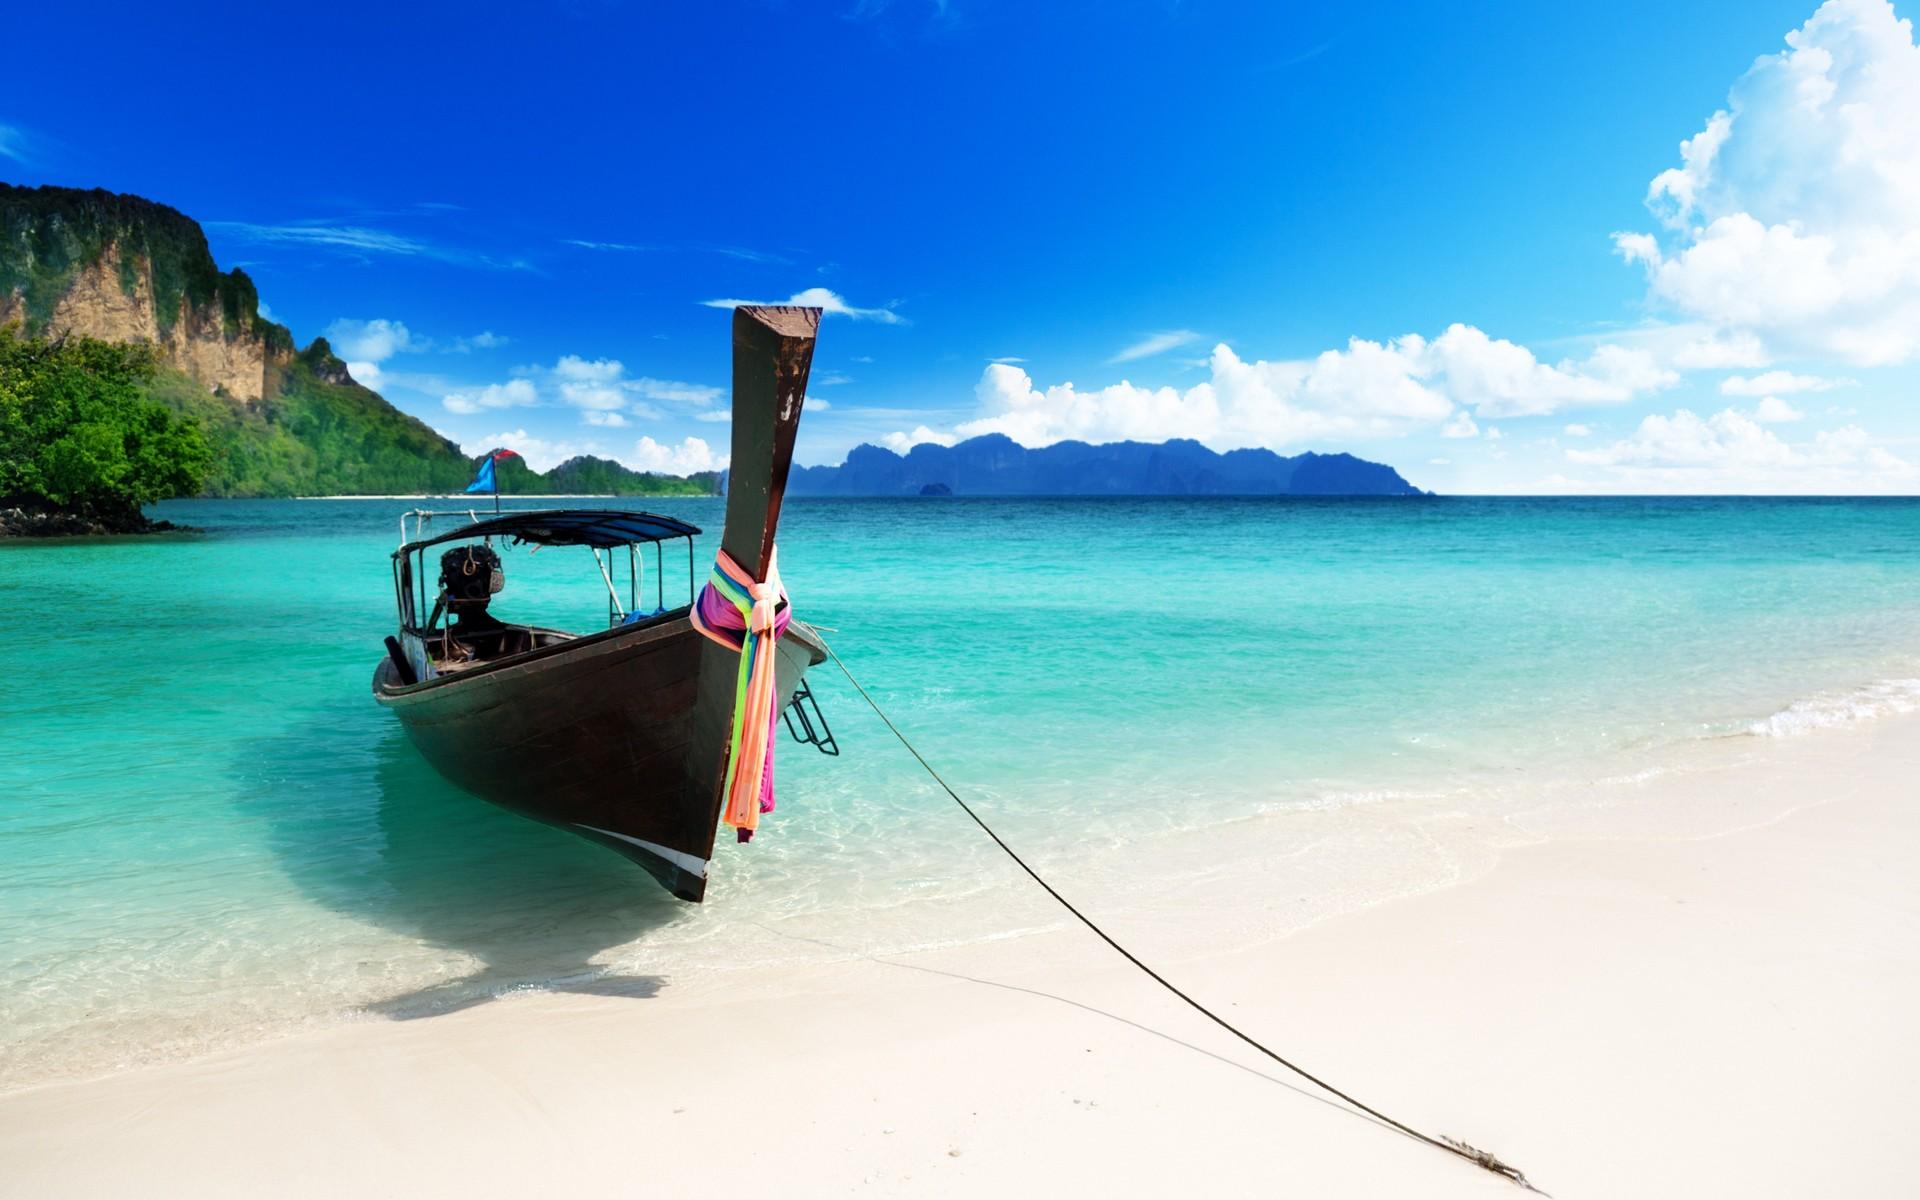 синее море и пляж